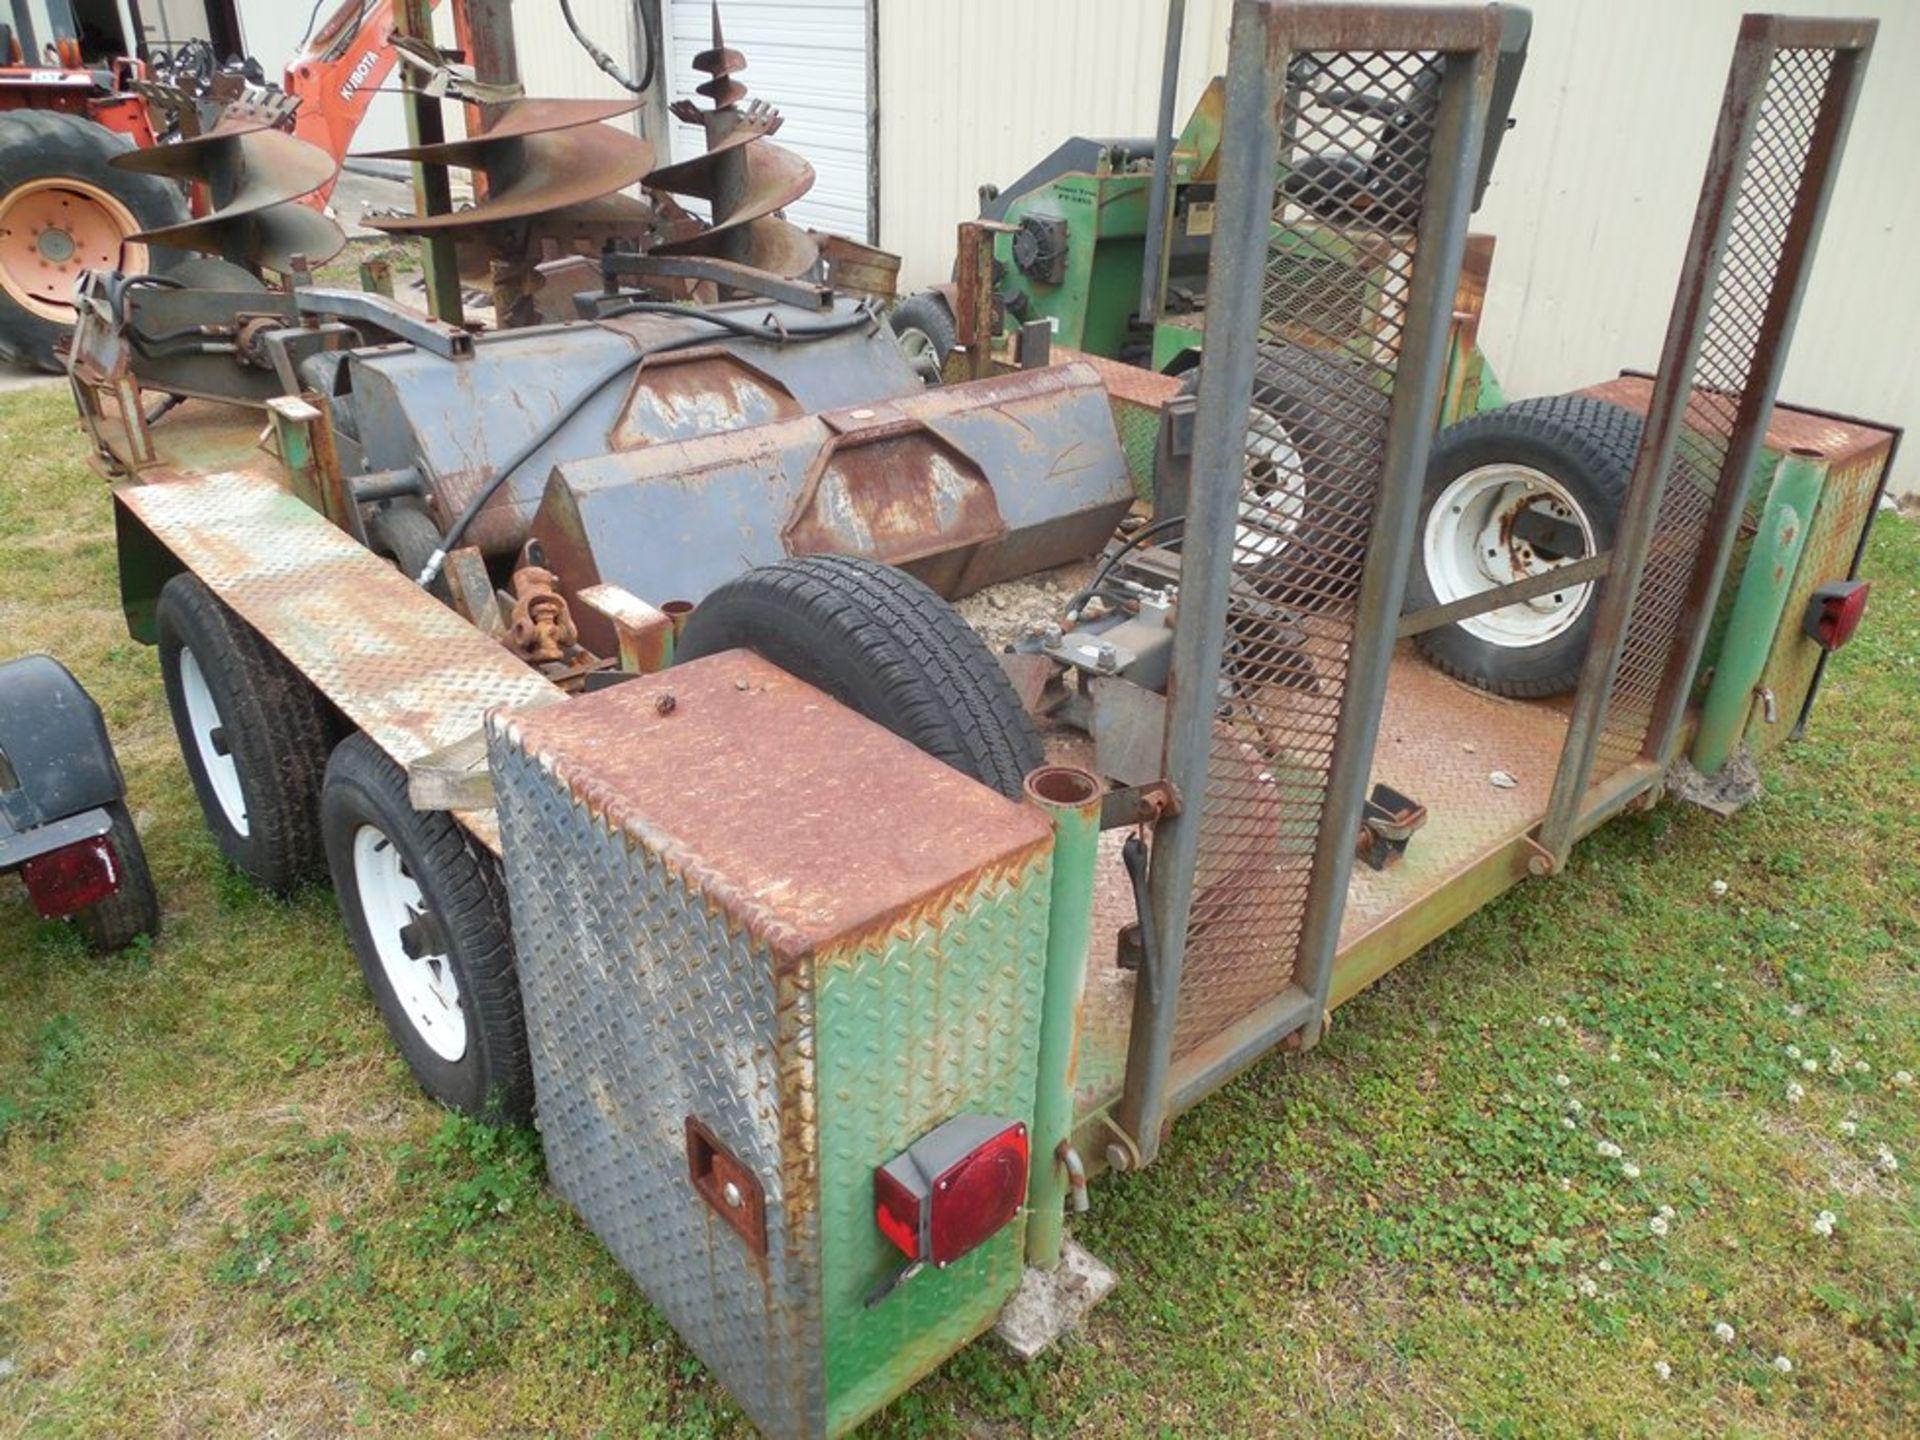 Power Trac PT-2425 Mini Skid Steer ser# 18928 with trailer, power rake, tree spade, front bucket, - Image 10 of 13